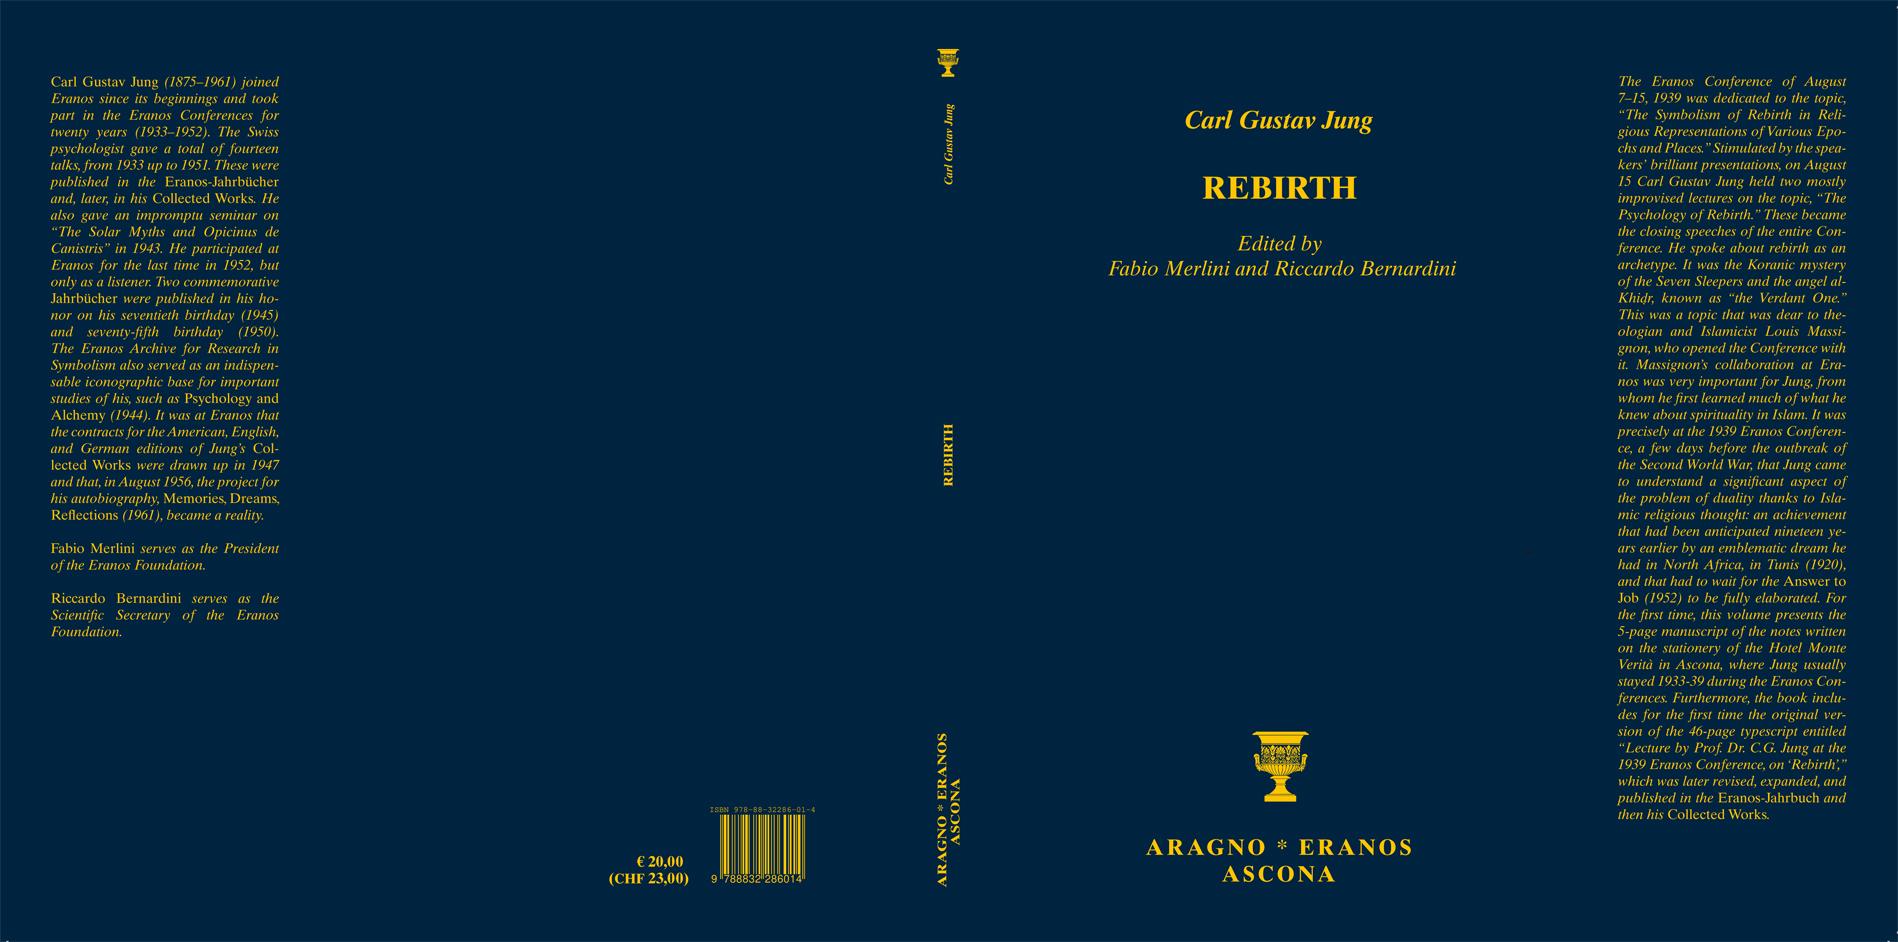 Arag_Eranos JUNG rebirth-@1@